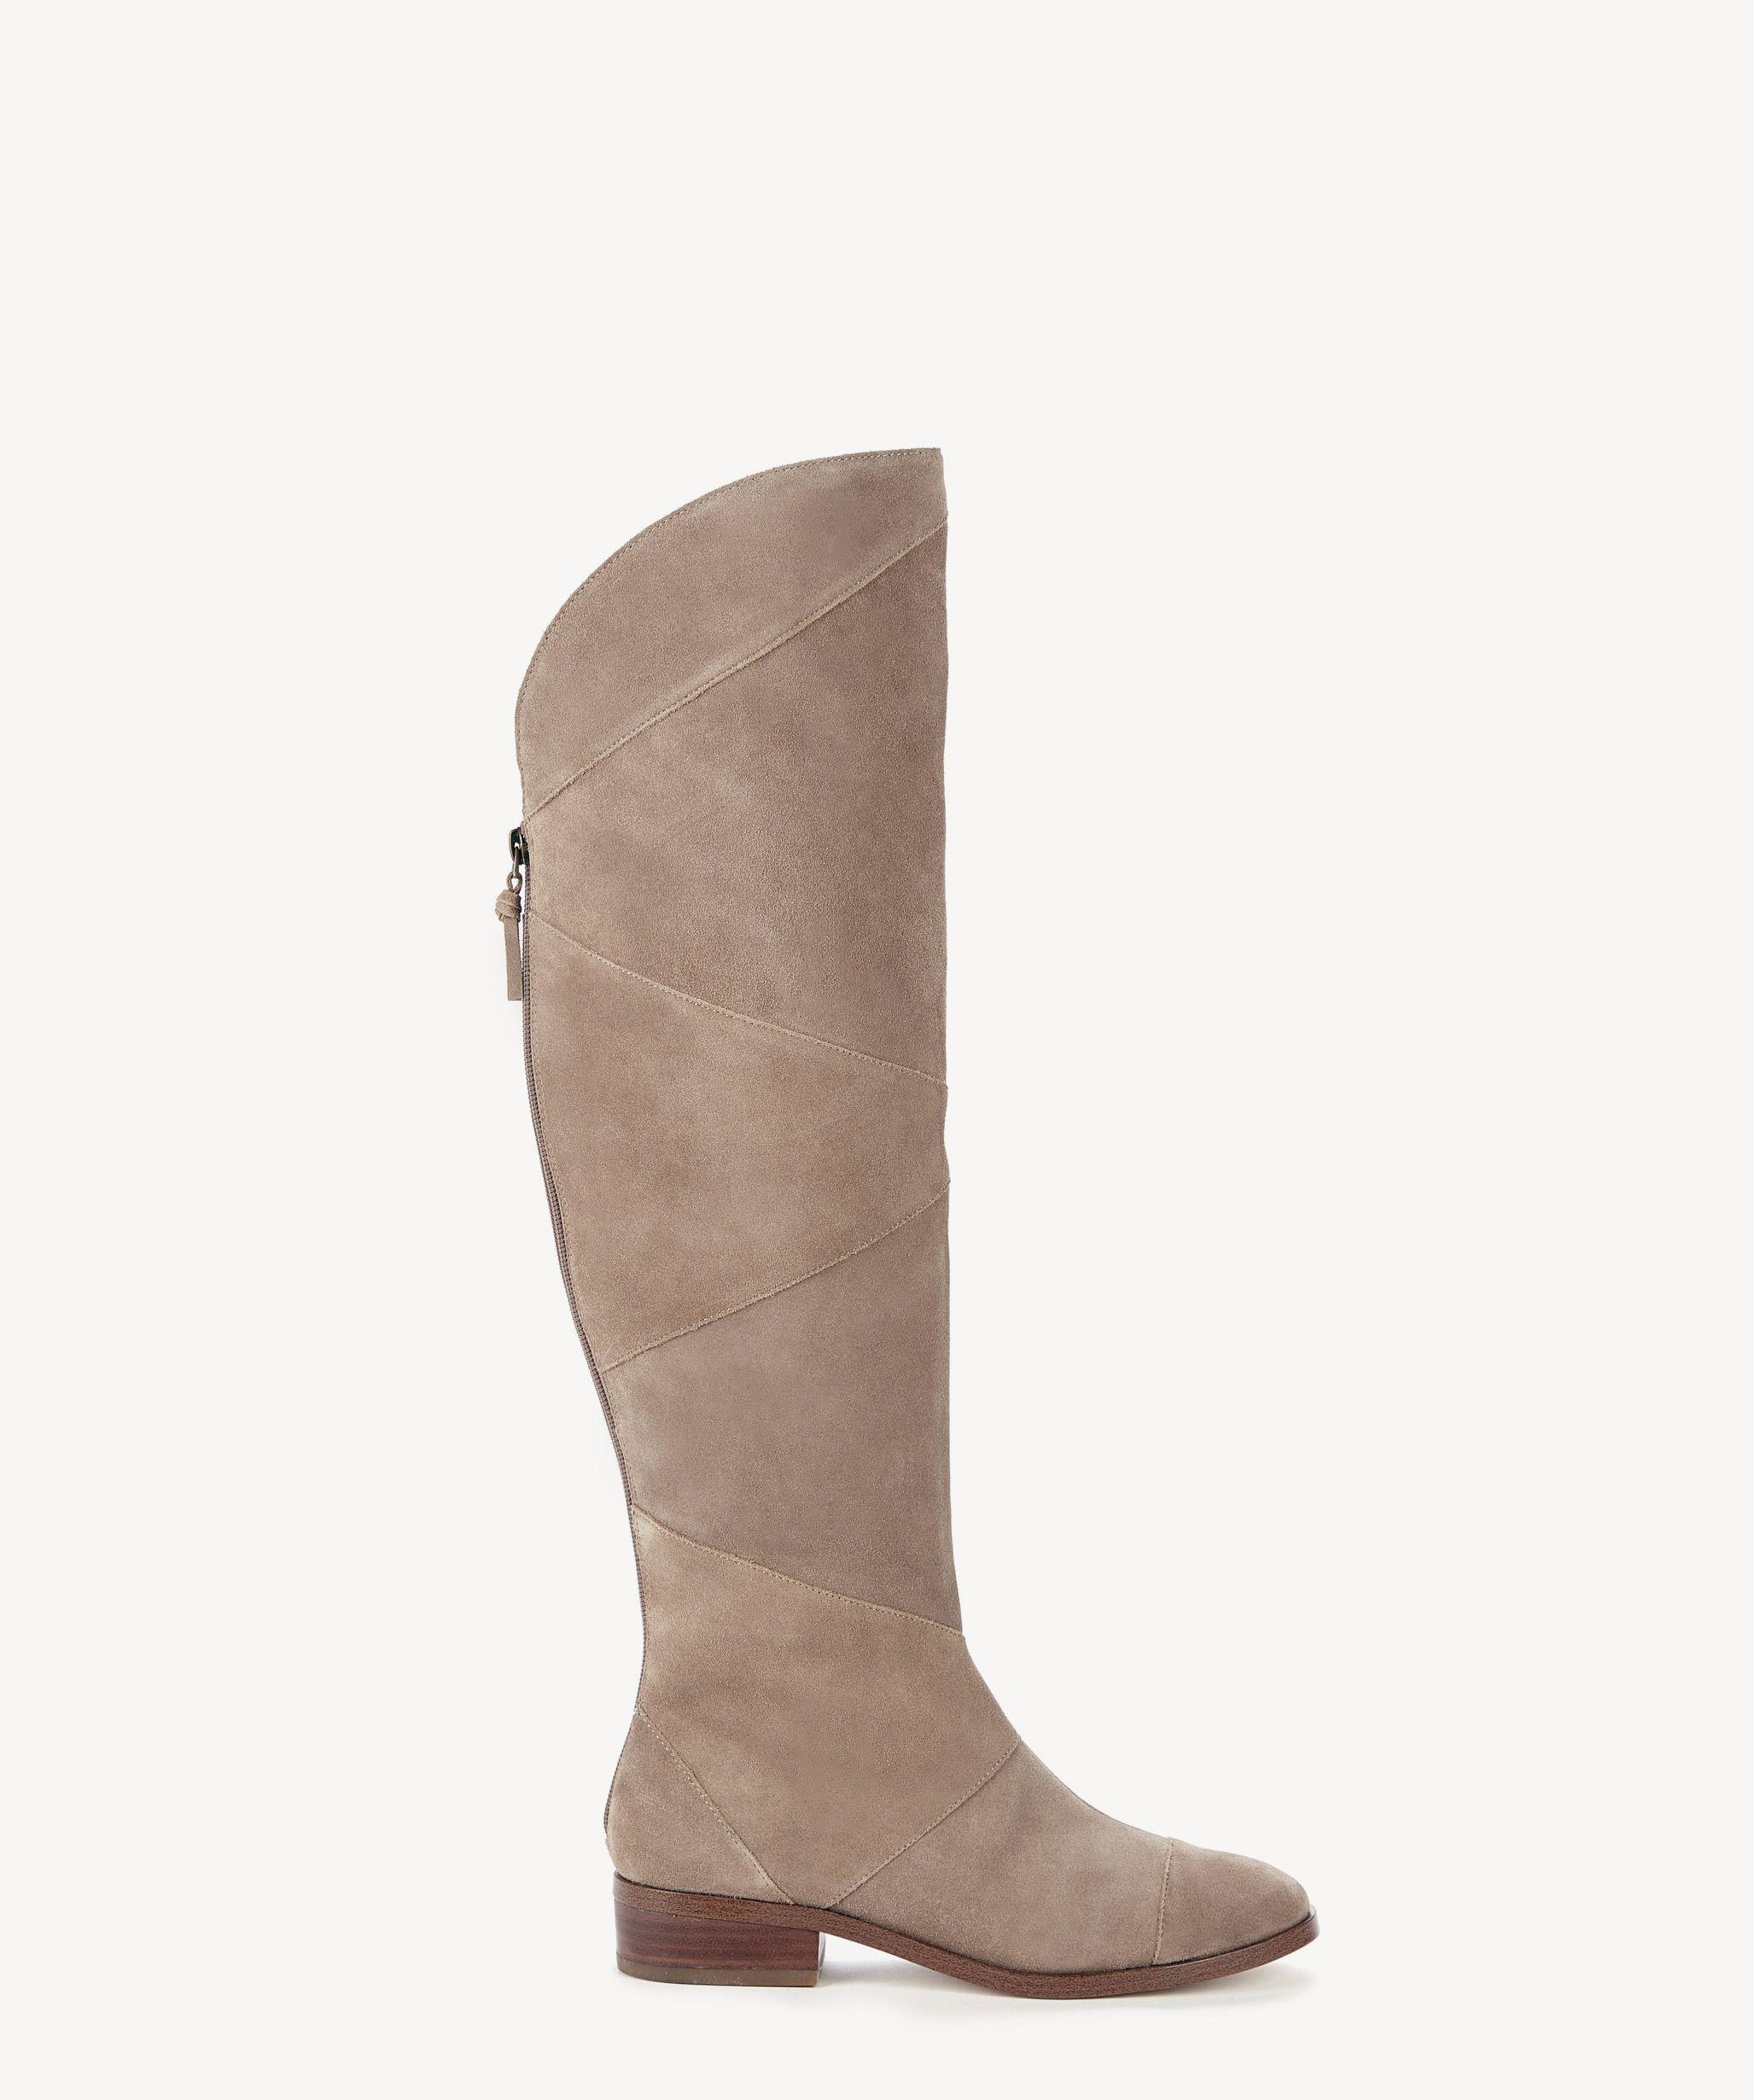 813487c3f20 Lyst - Sole Society Tiff Otk Boot in Brown